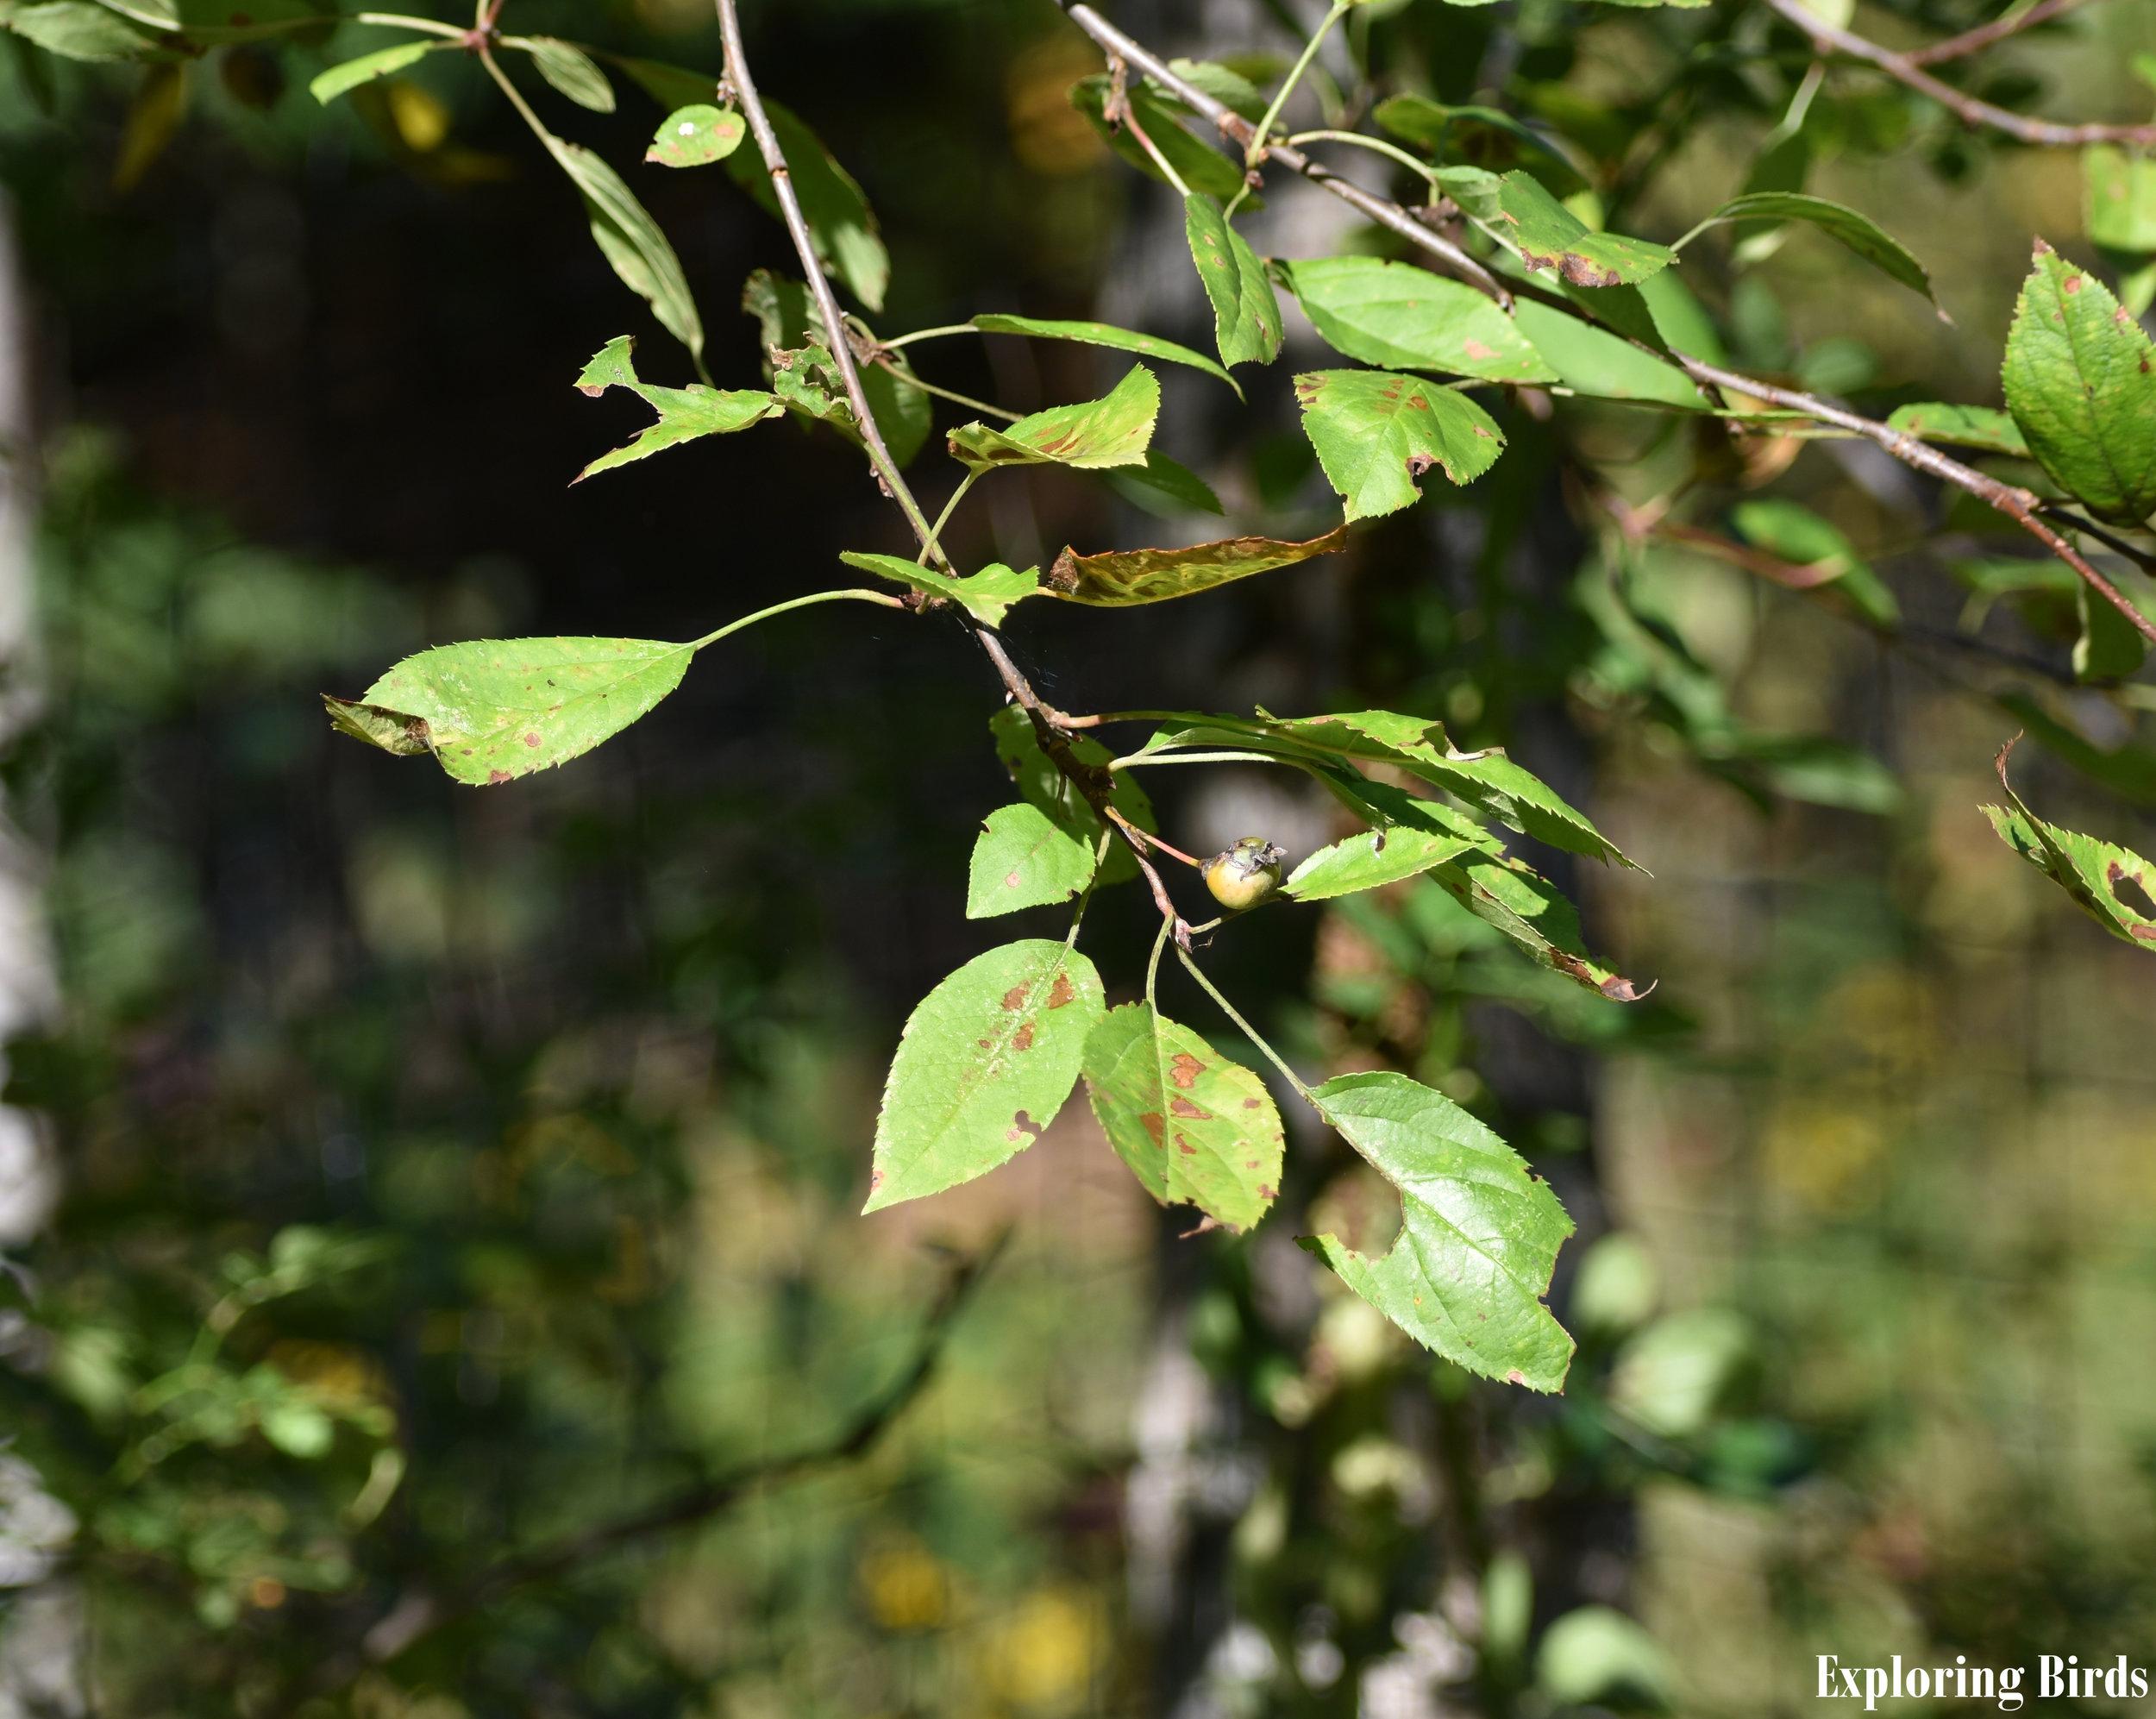 American Crabapple leaves